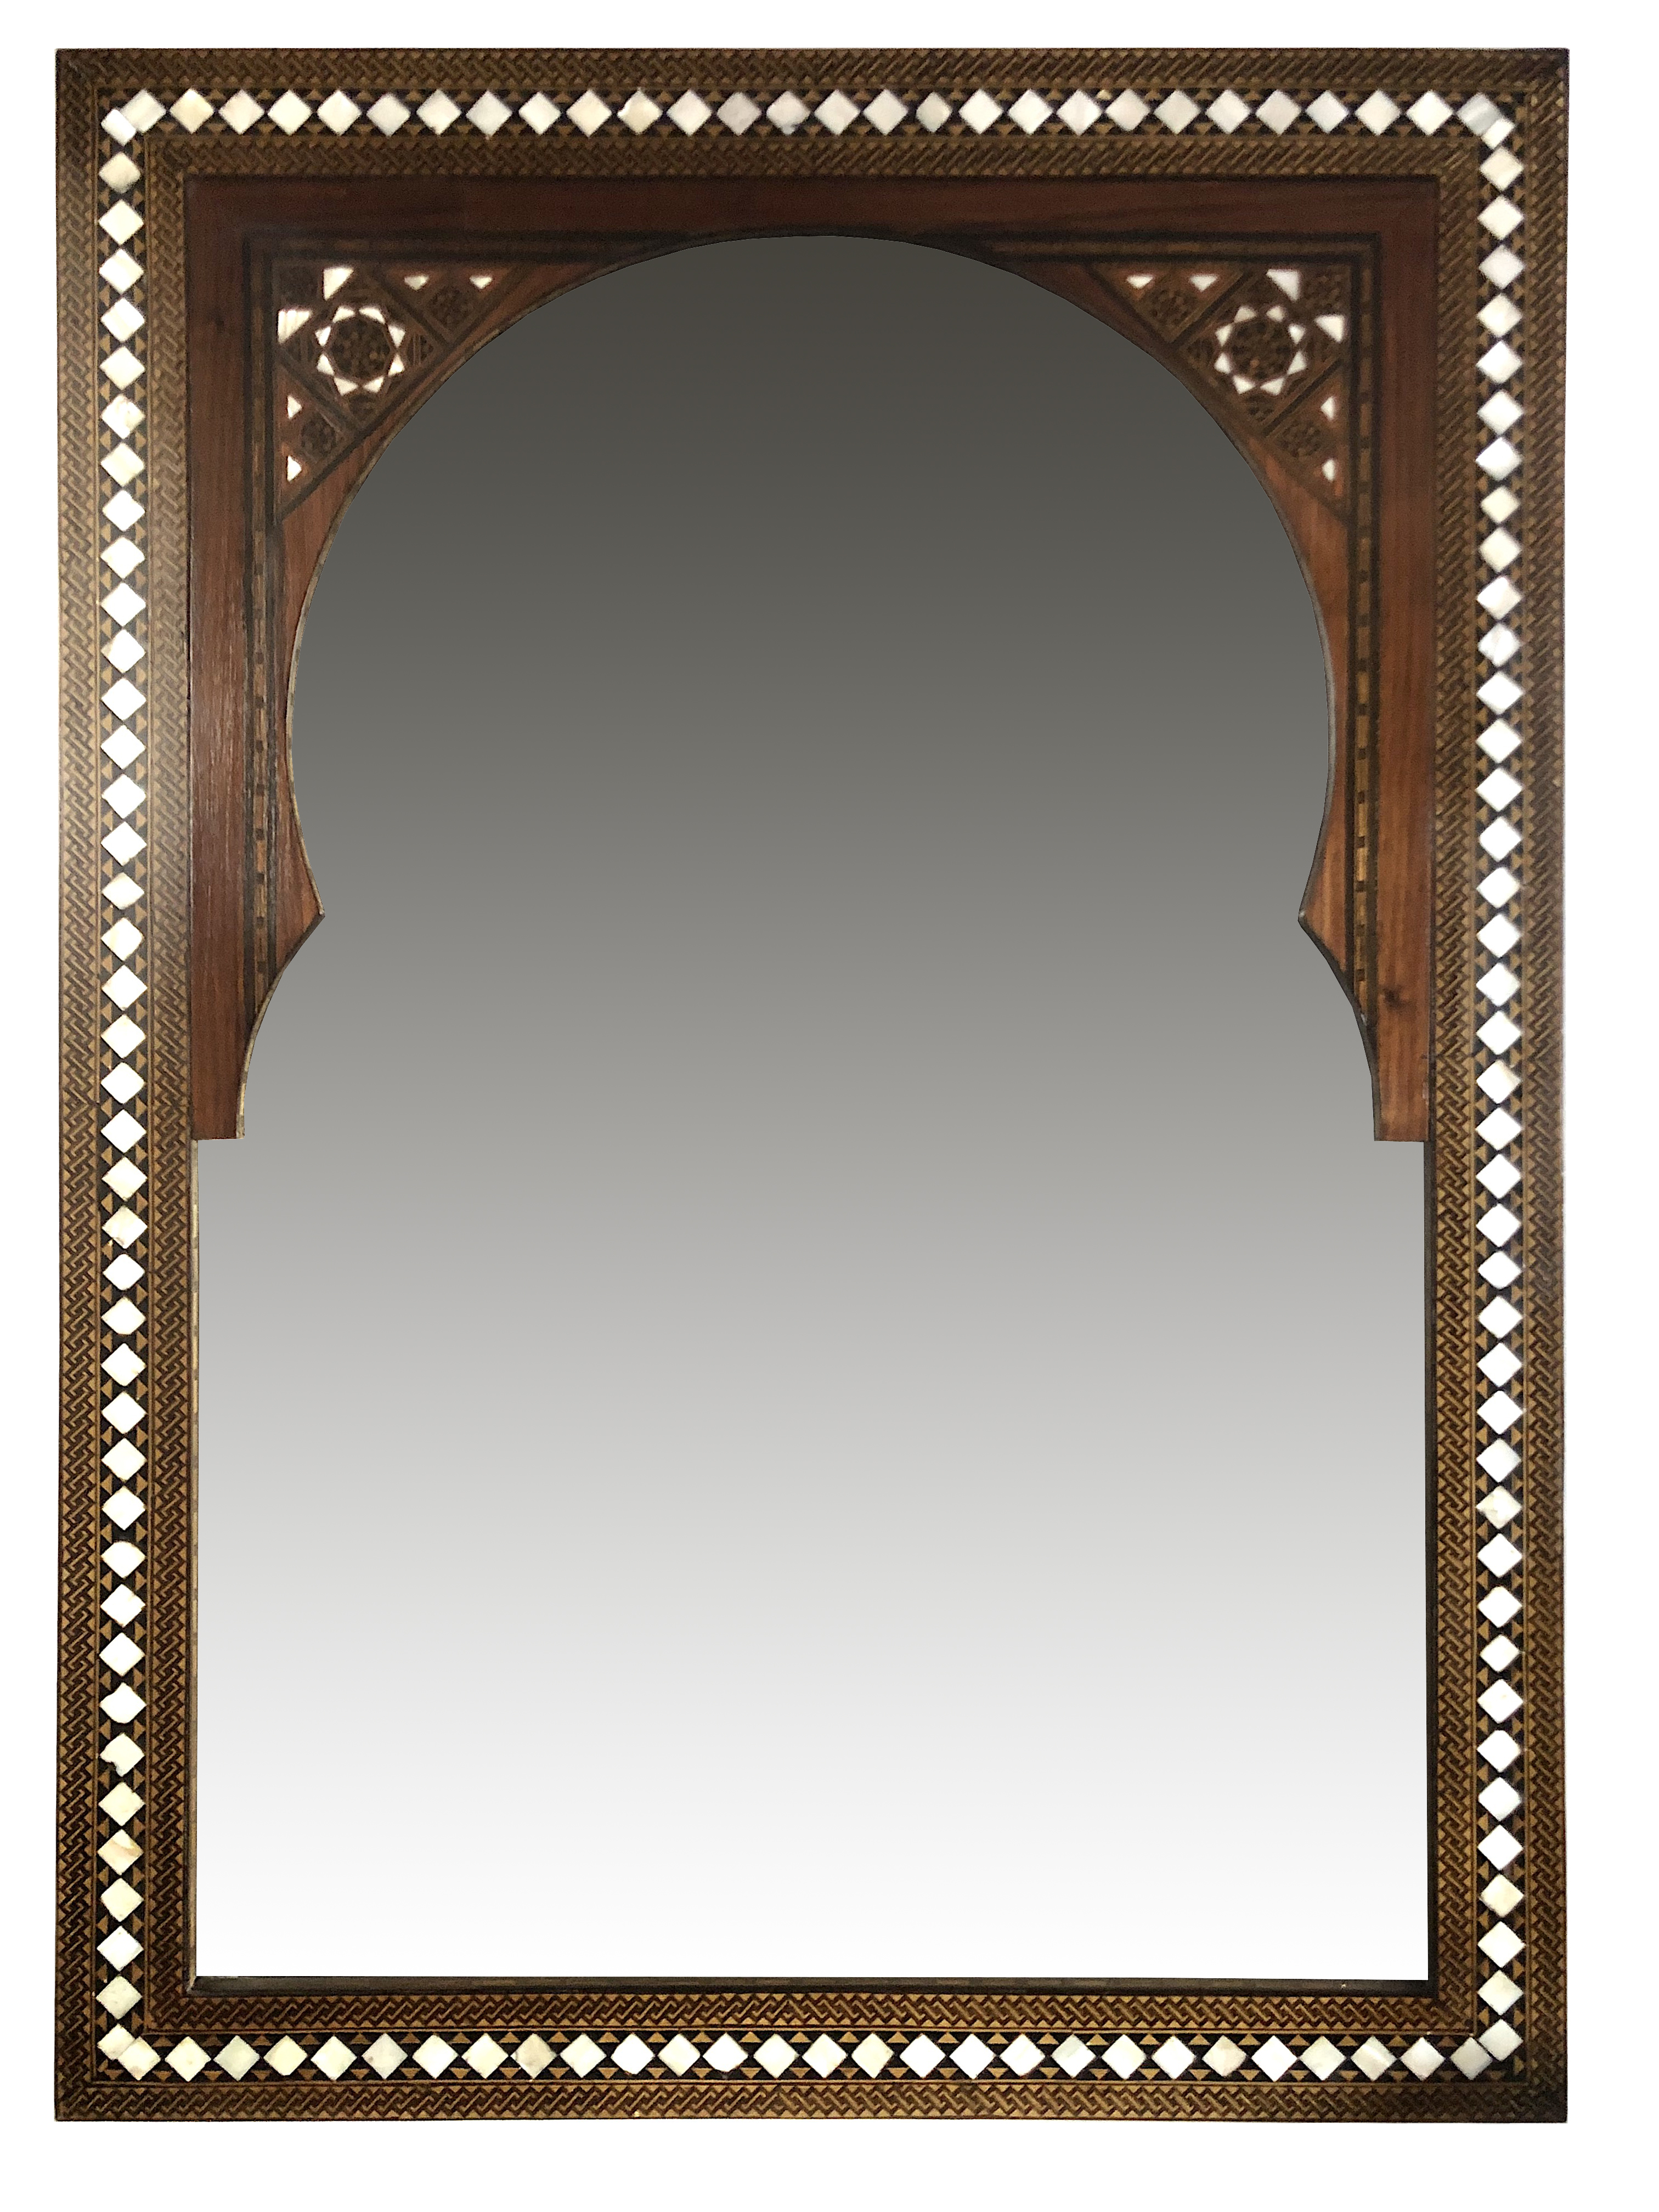 Vintage mosaic Syrian mirror